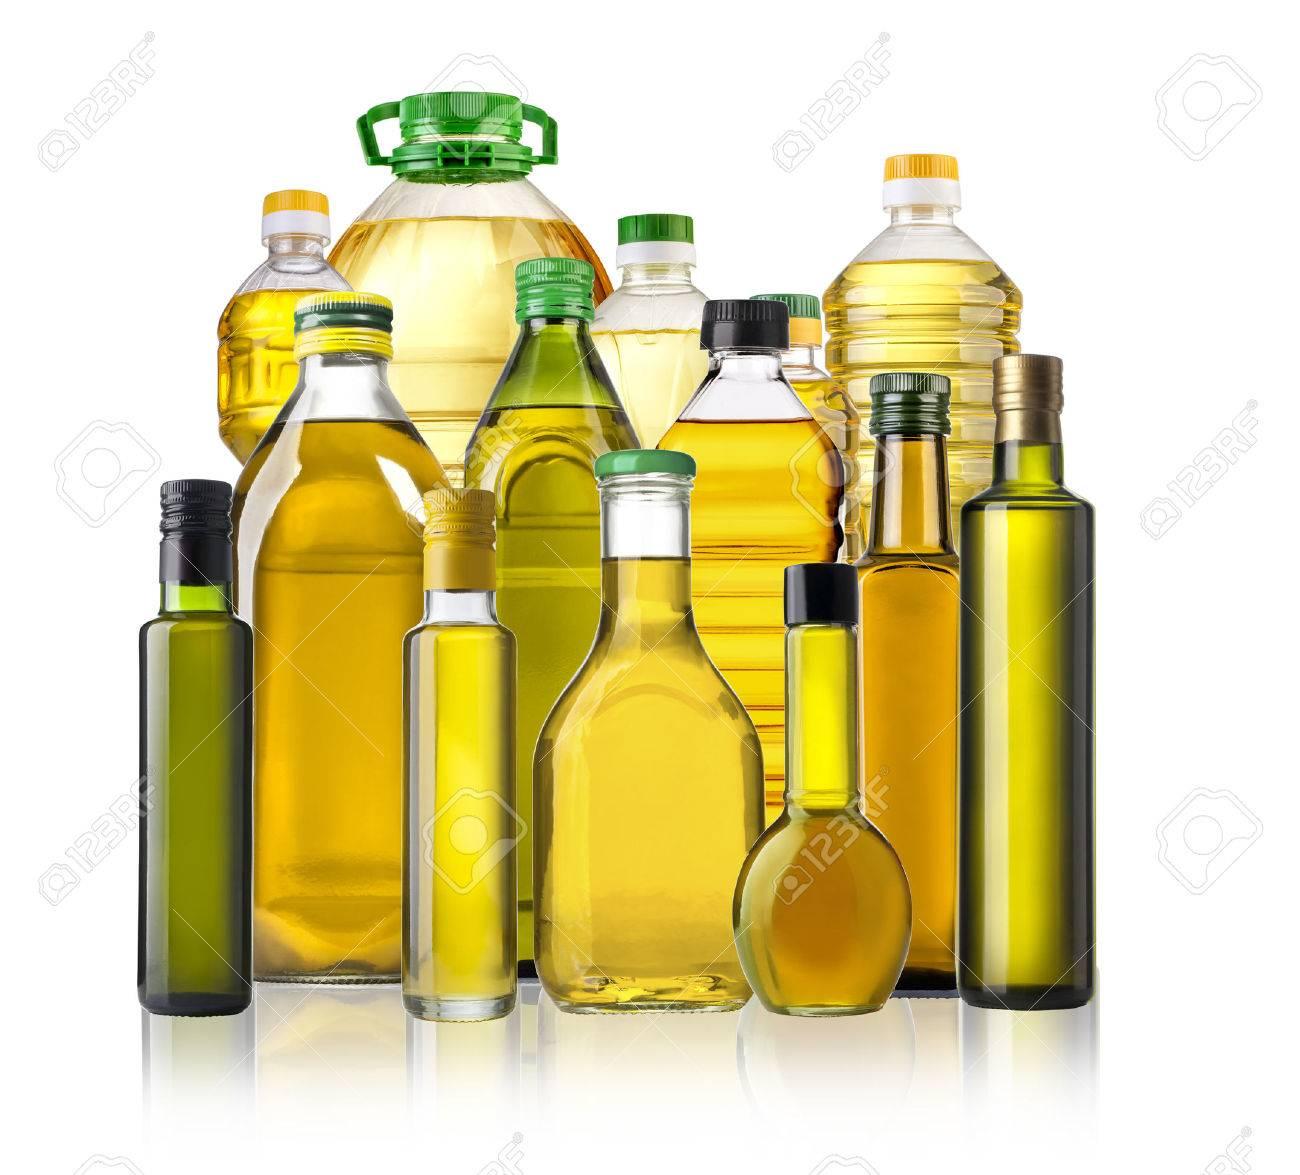 Olive oil bottles isolated on white background - 47856369